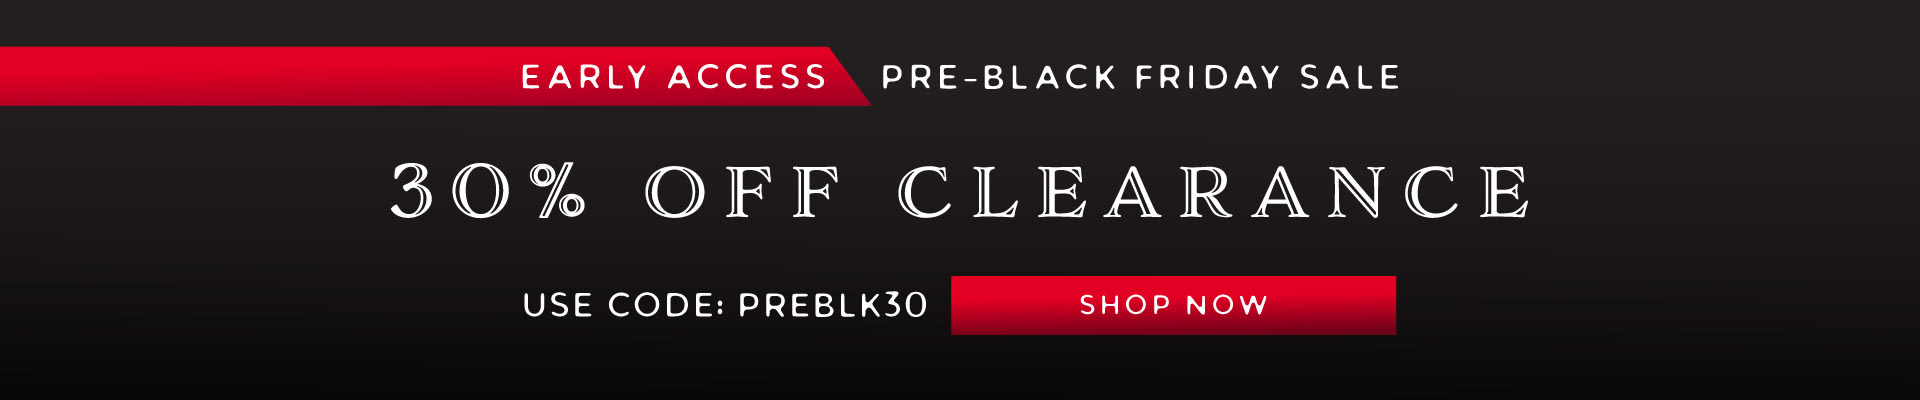 Pre-Black Friday Sale!